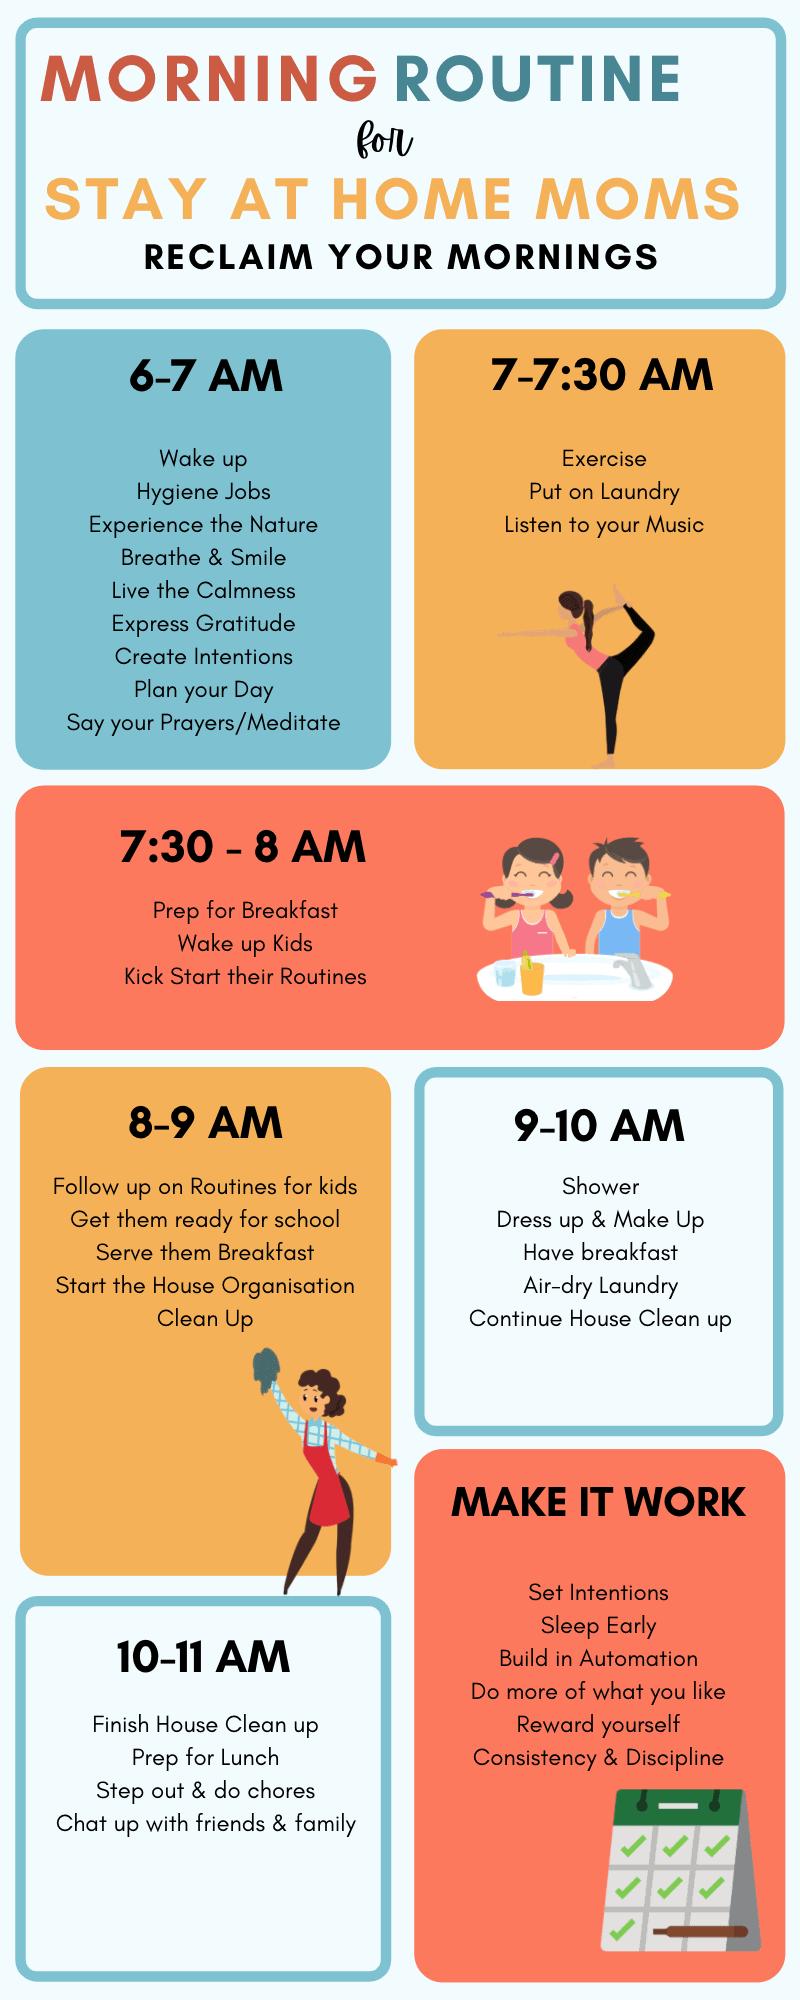 Sample Morning Routine for SAHMs